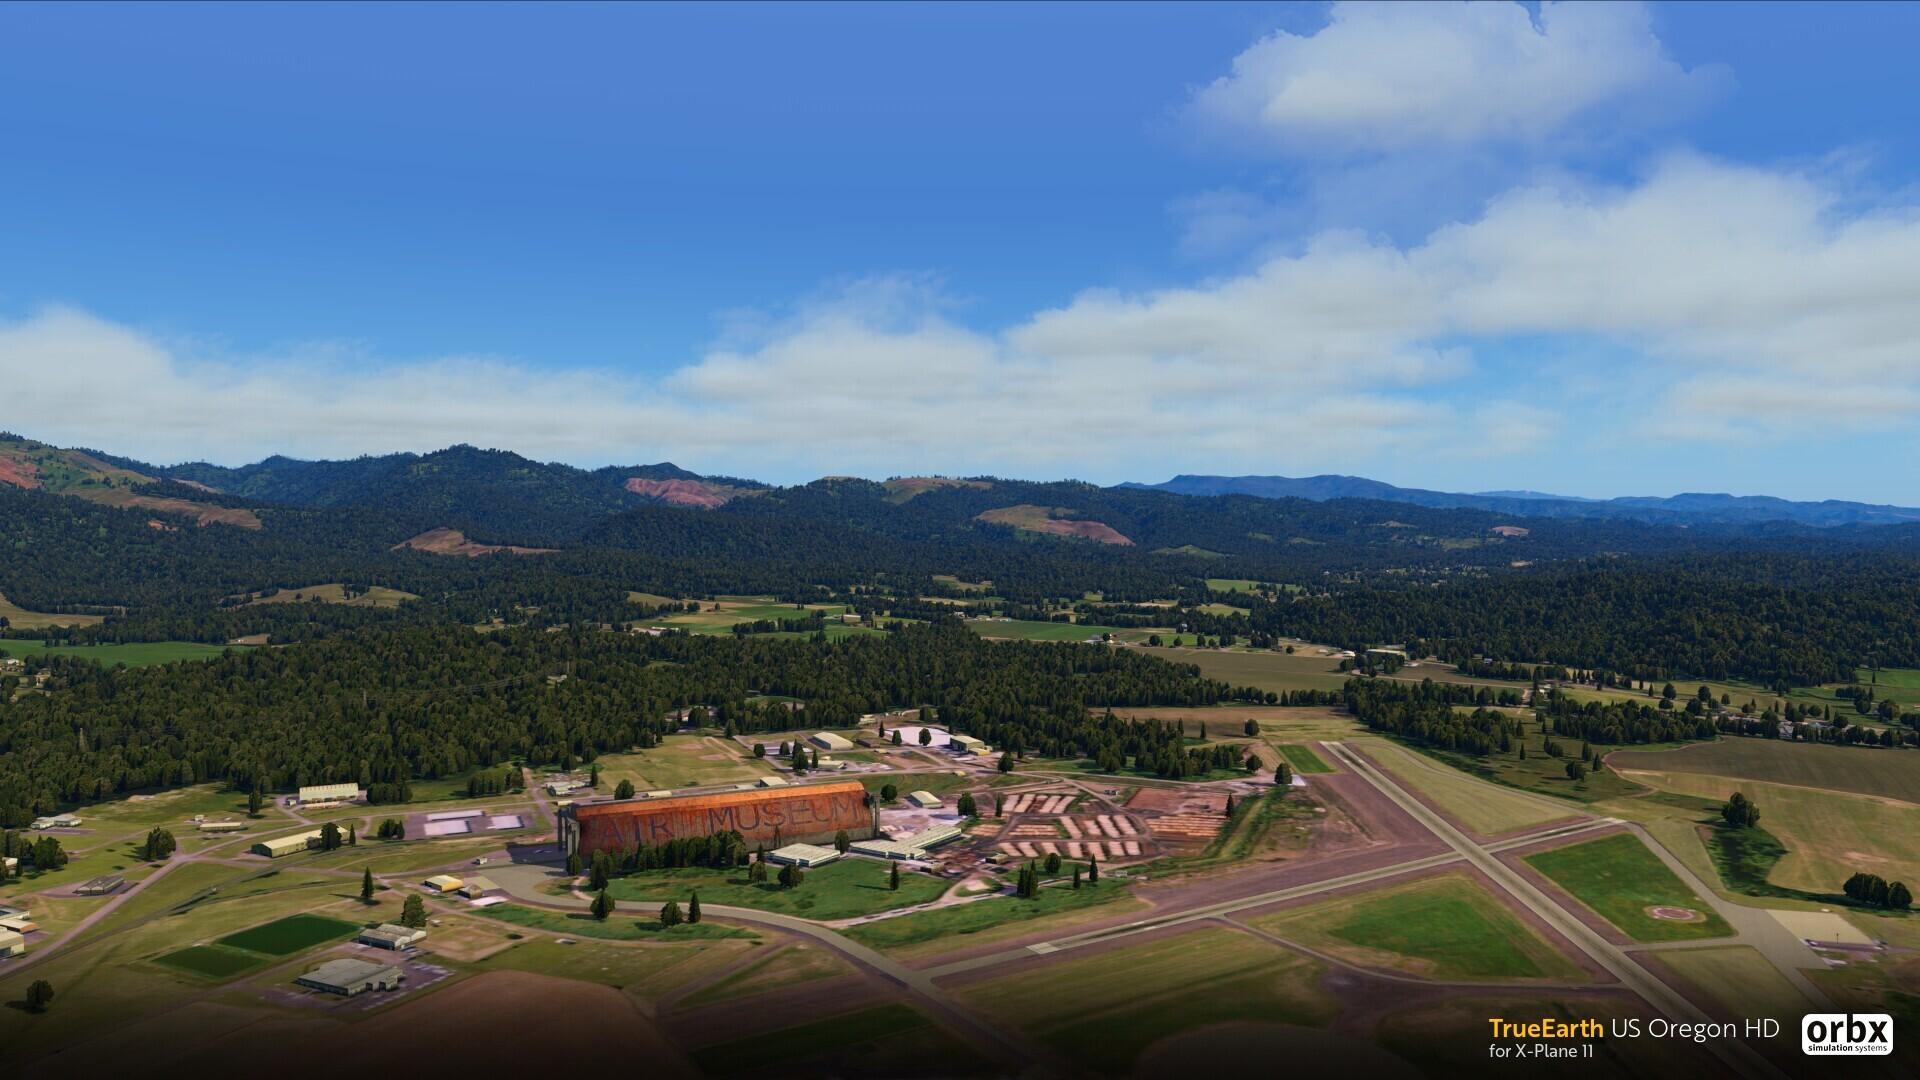 TrueEarth US Oregon HD - X-Plane 11